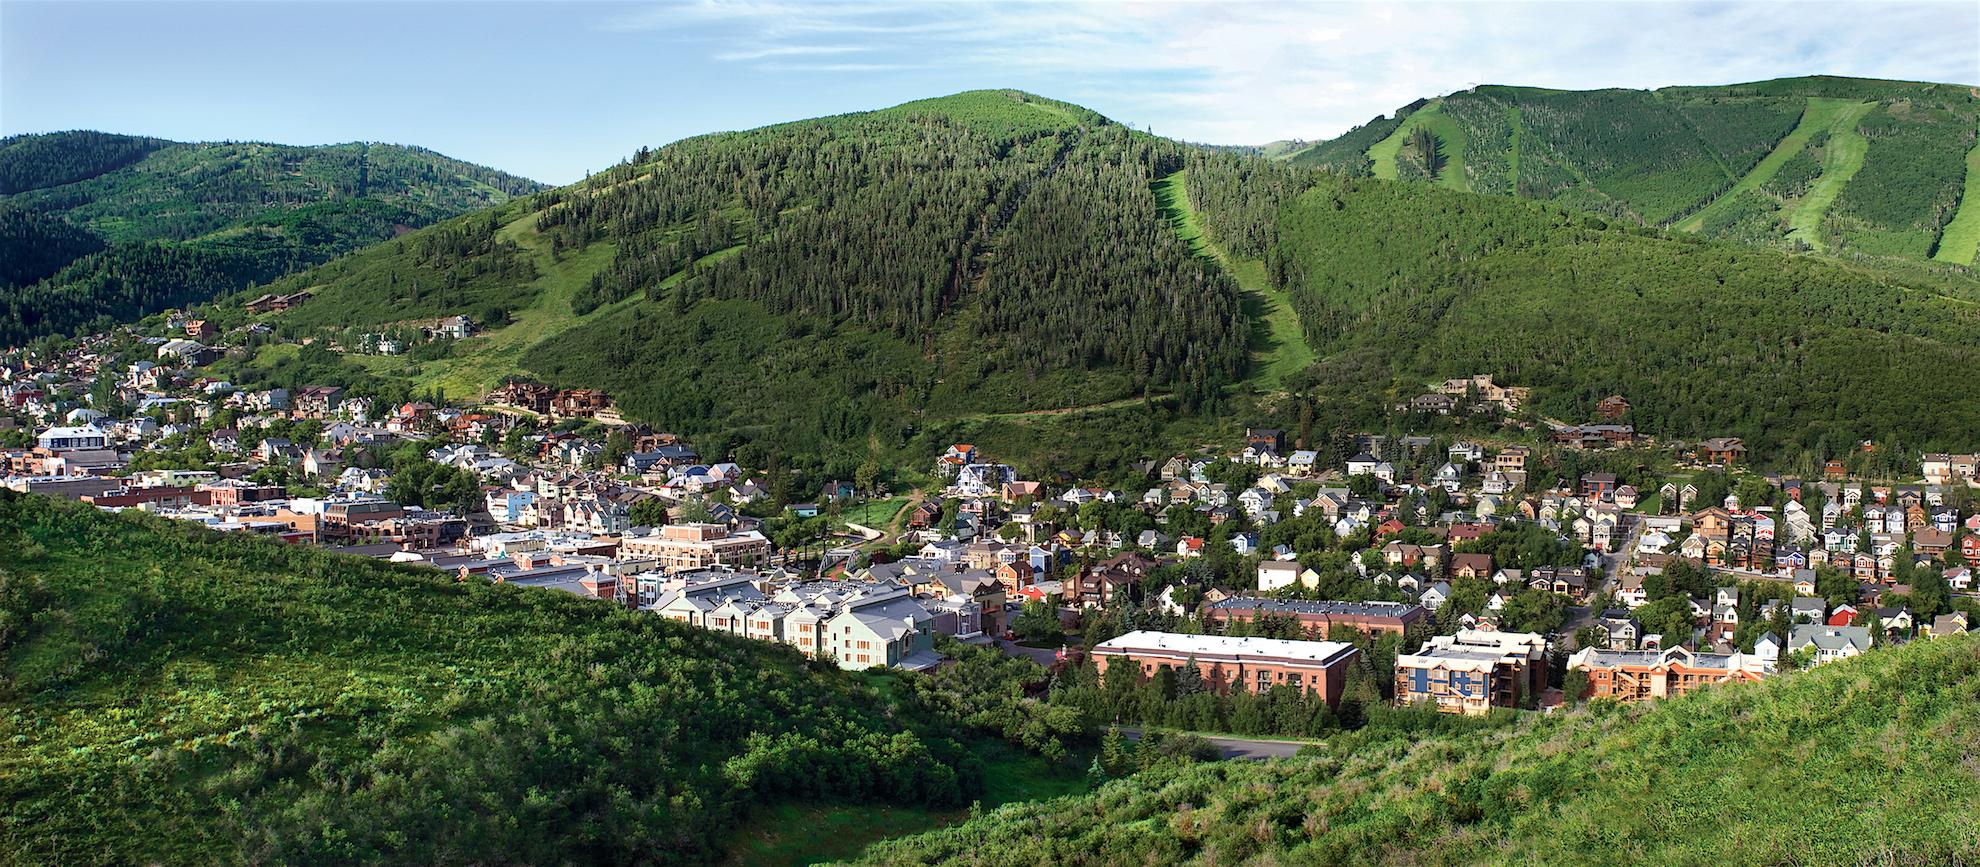 Sundance Home Decor Fall In Love With Park City Utah World Bride Magazine